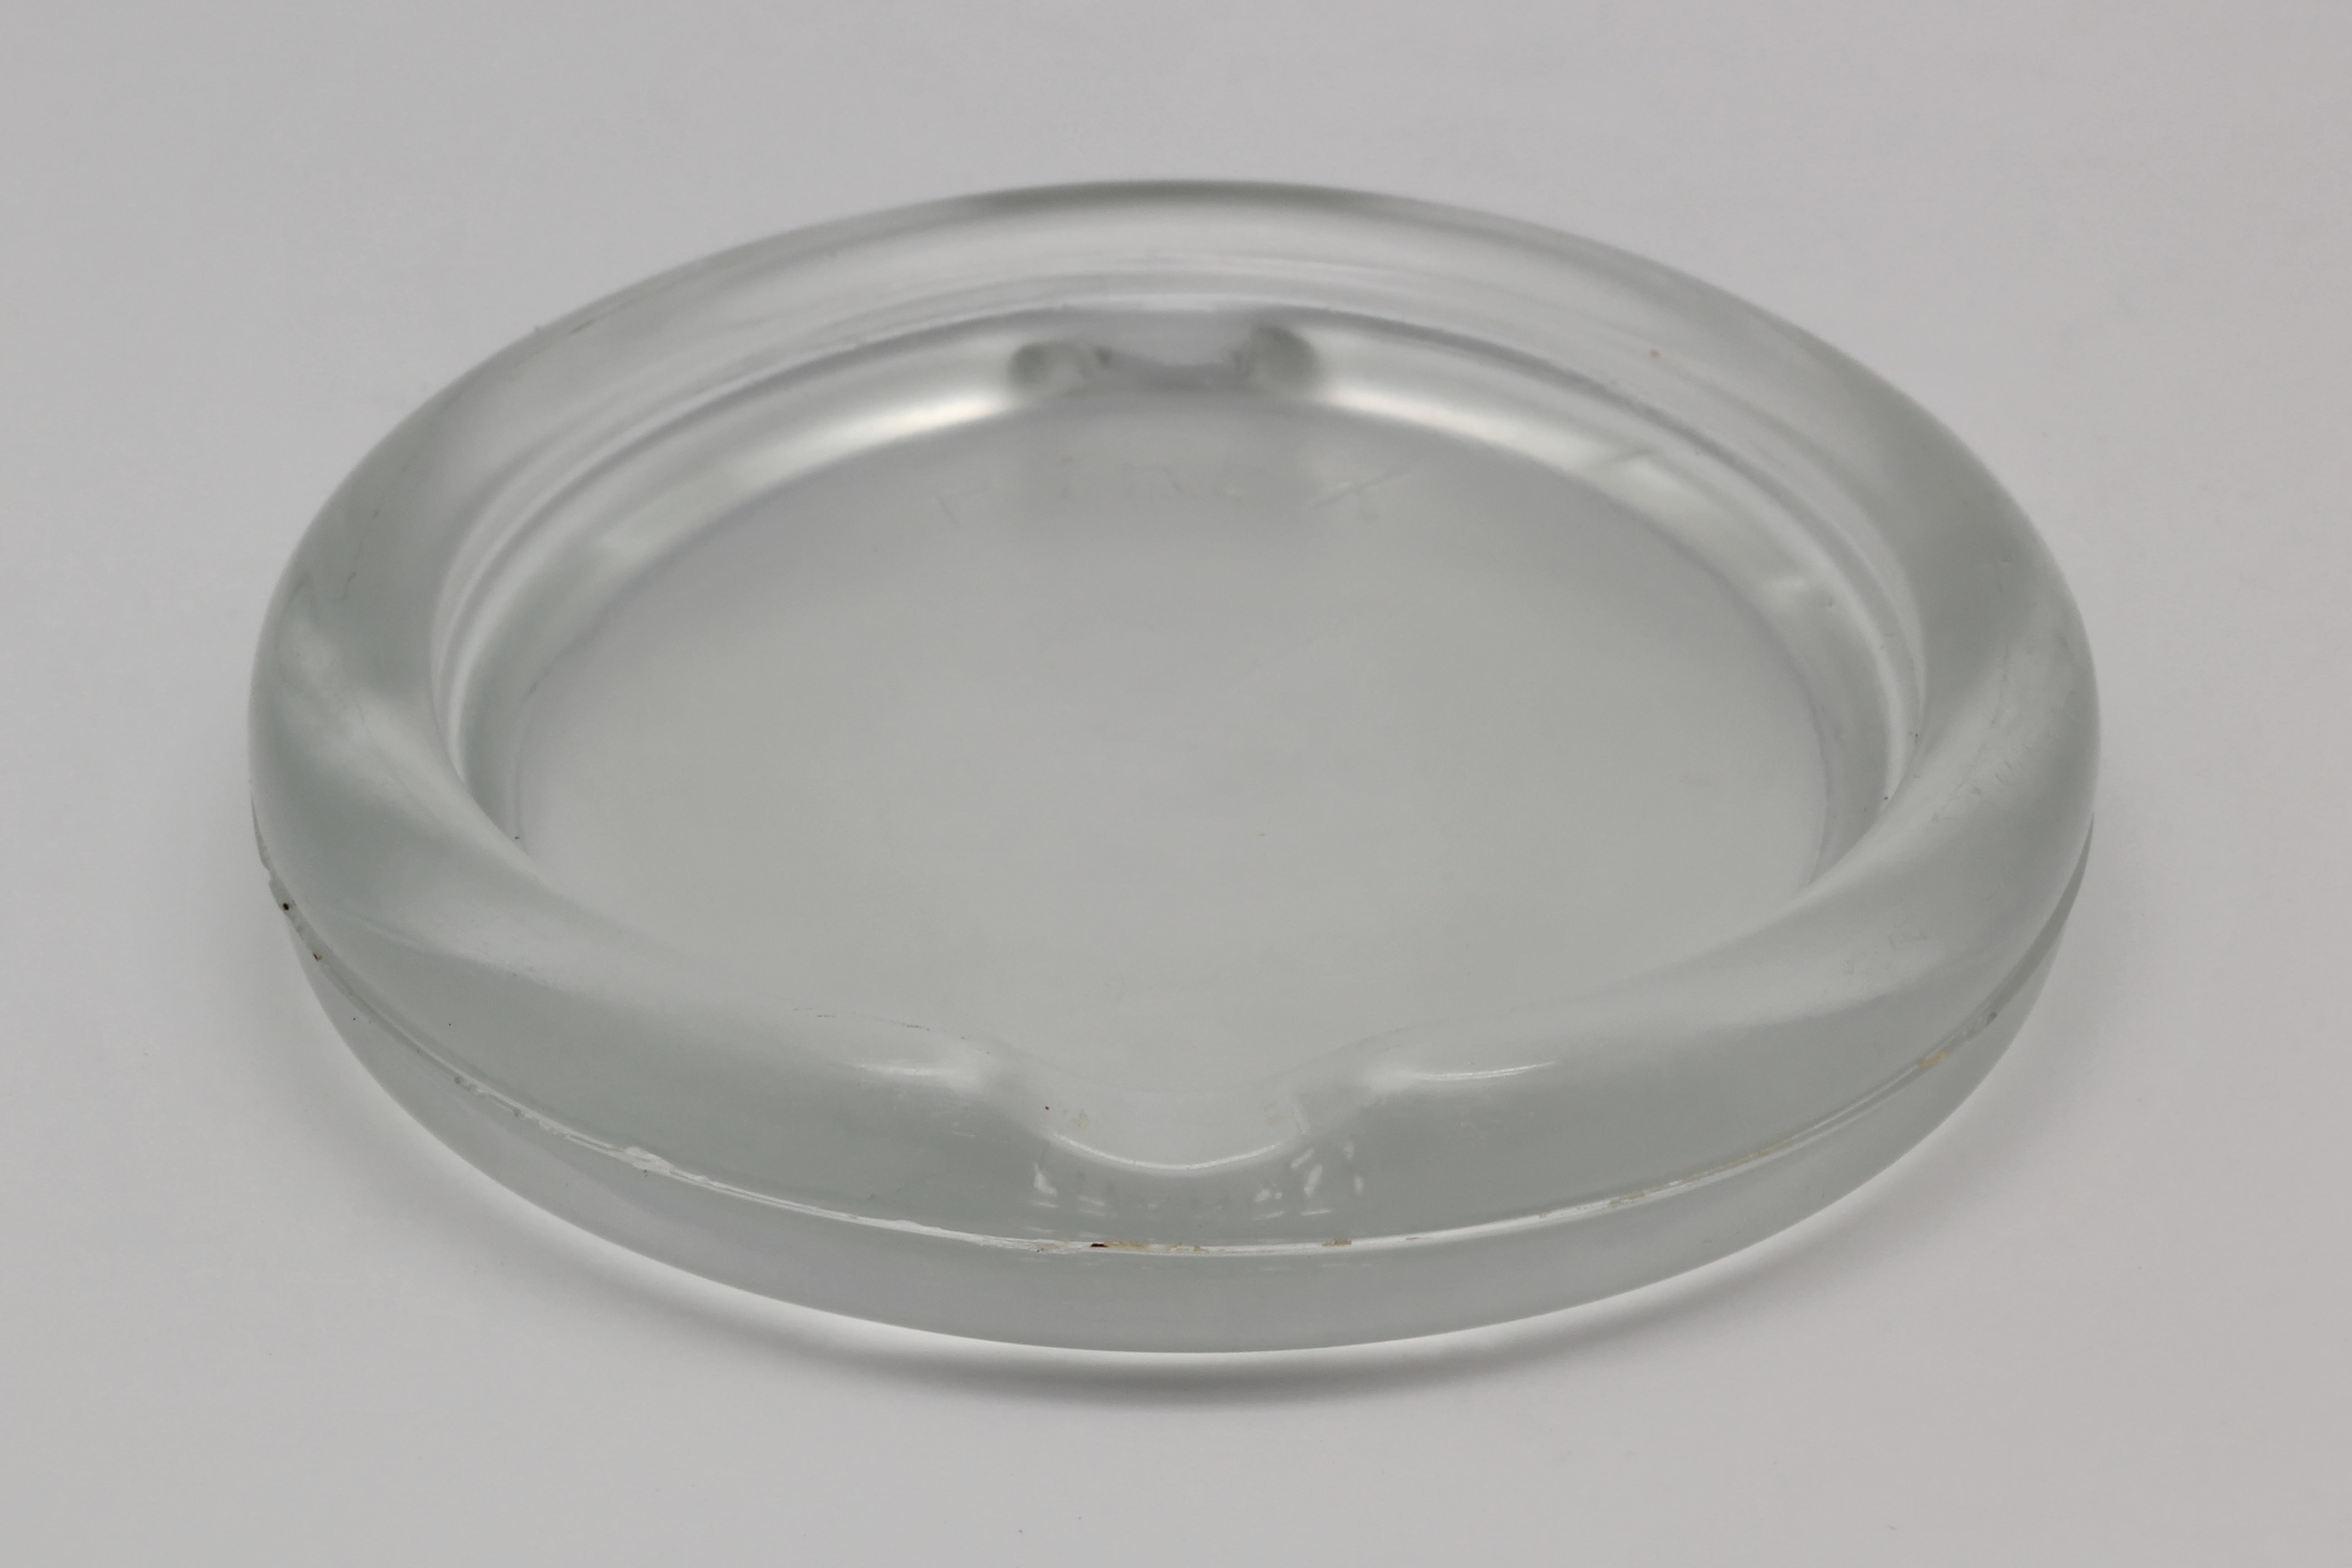 File:Anti-monte-lait en Pyrex 02.jpg - Wikimedia Commons